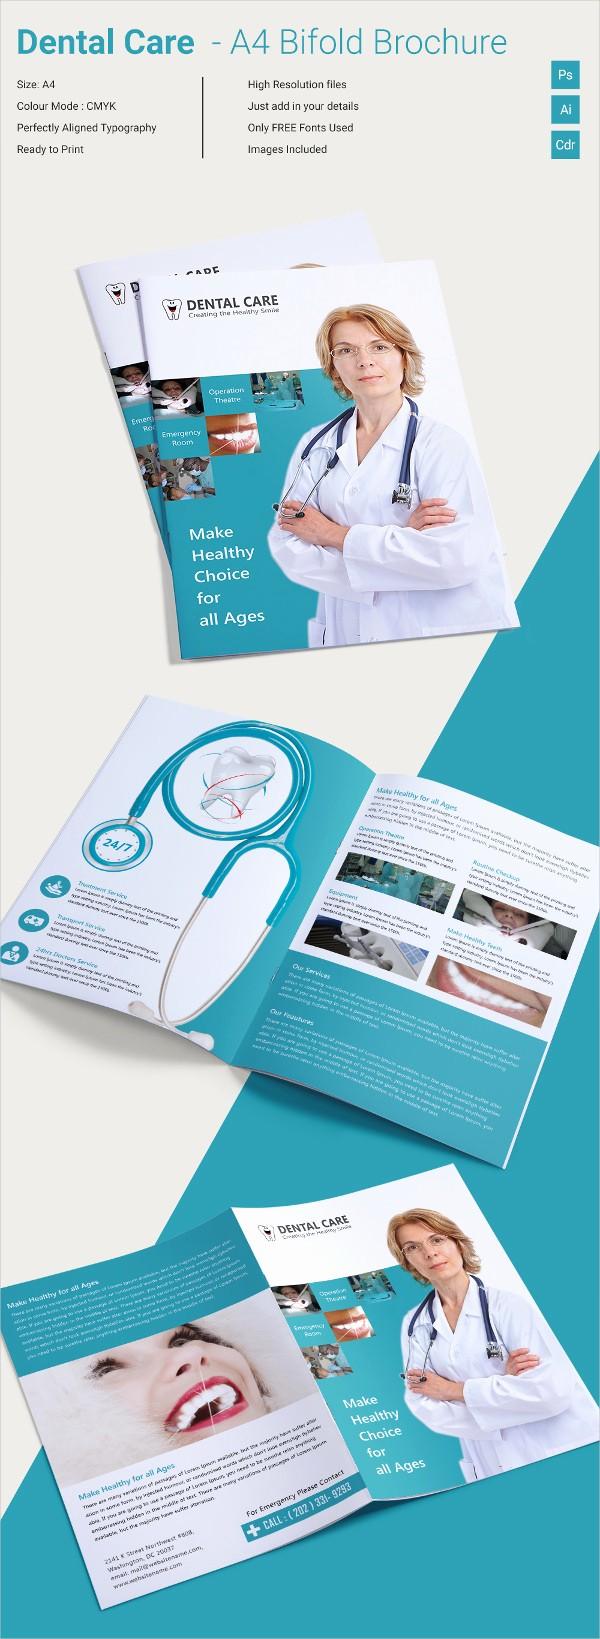 Bi Fold Brochure Templates Free Lovely Superb Dental Care A4 Bi Fold Brochure